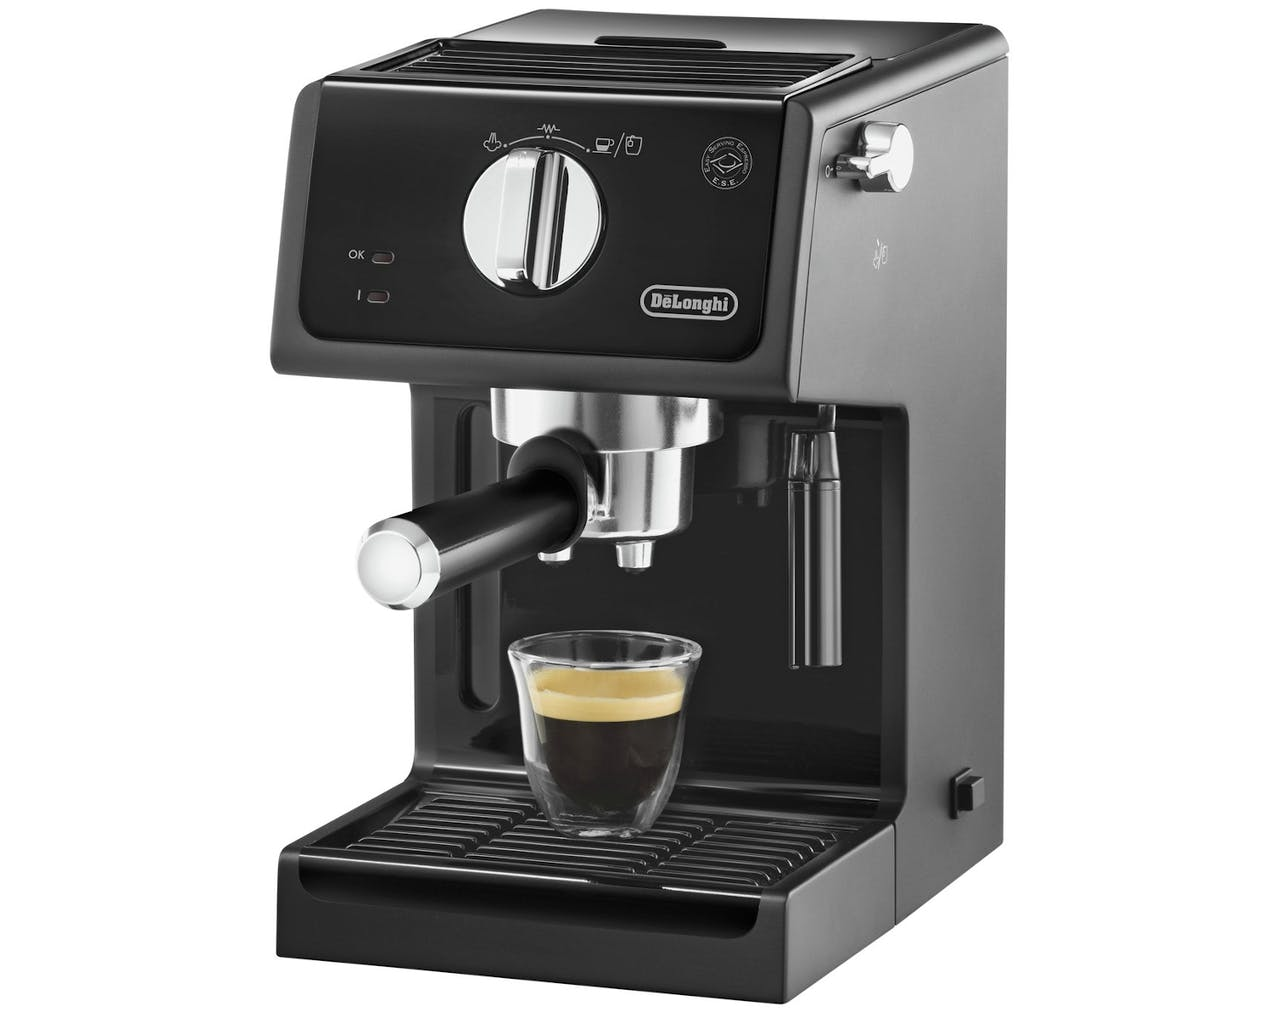 DeLonghi Espresso-Siebträgerautomat